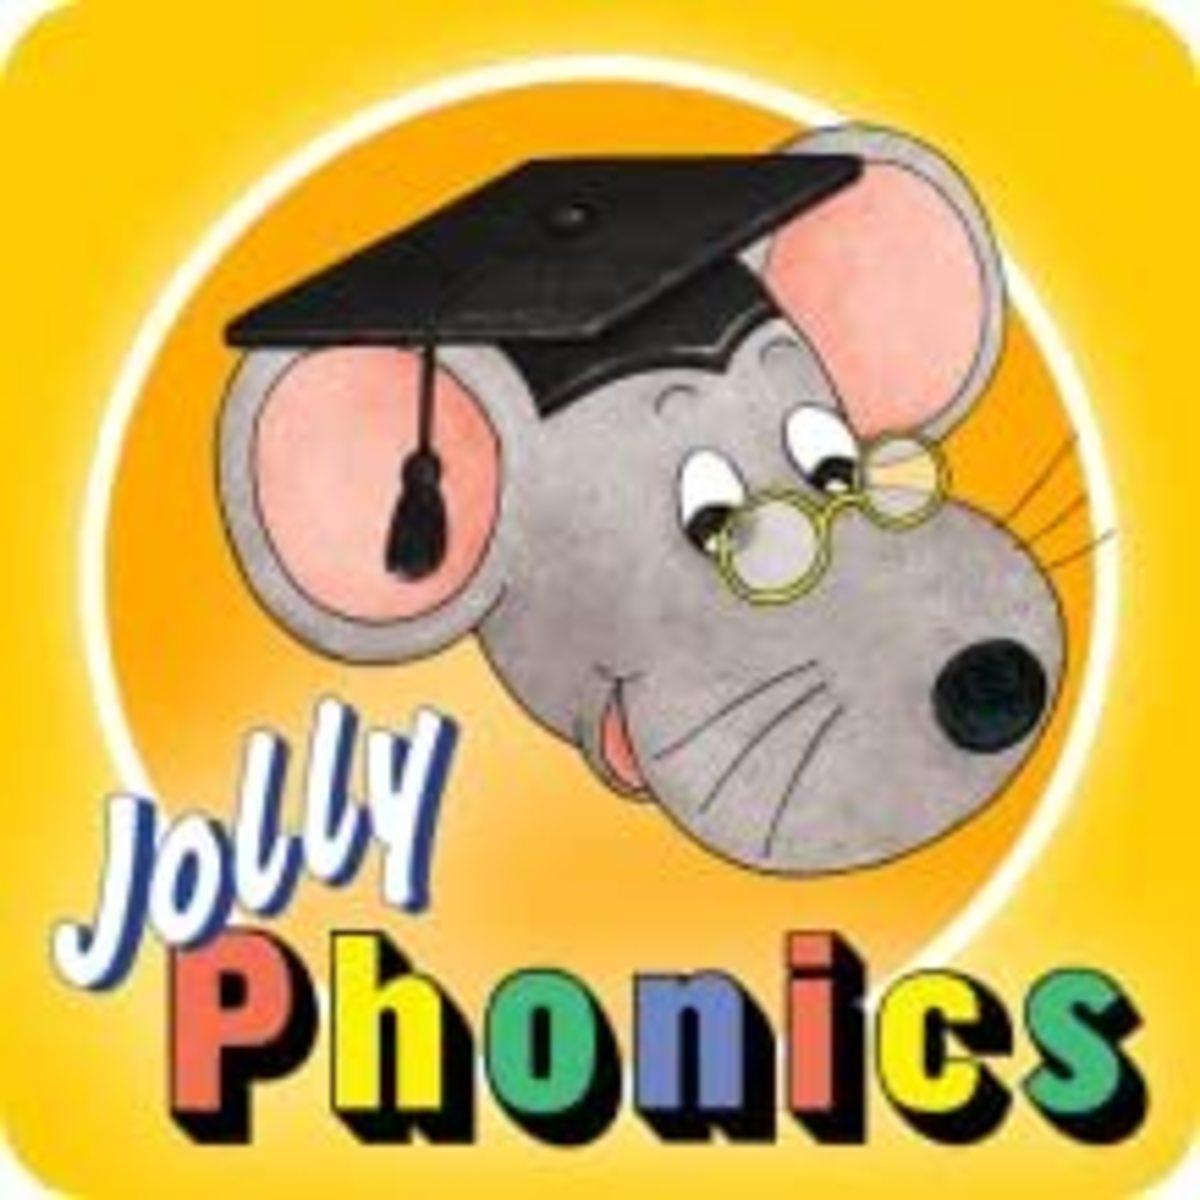 Using Jolly Phonics to Teach Phonics Skills